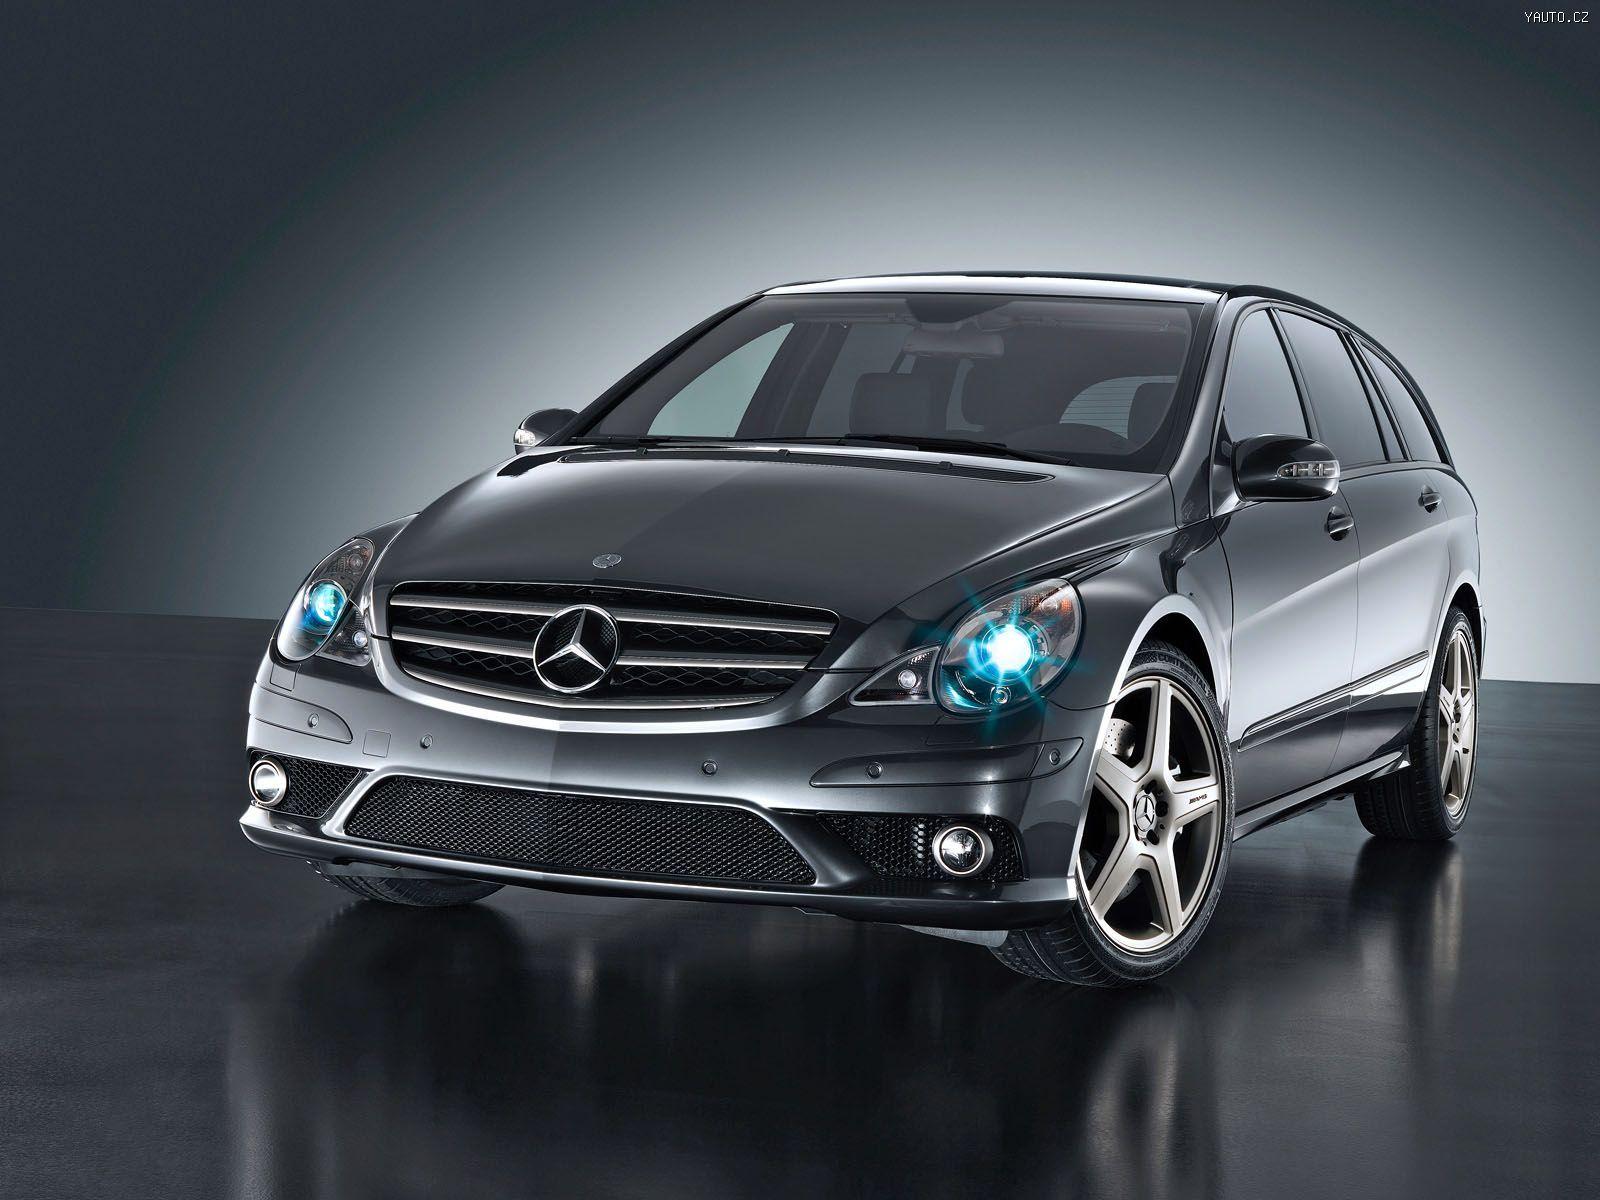 Mercedes Benz R63 AMG (2006) Auta na plochu, tapety na ...